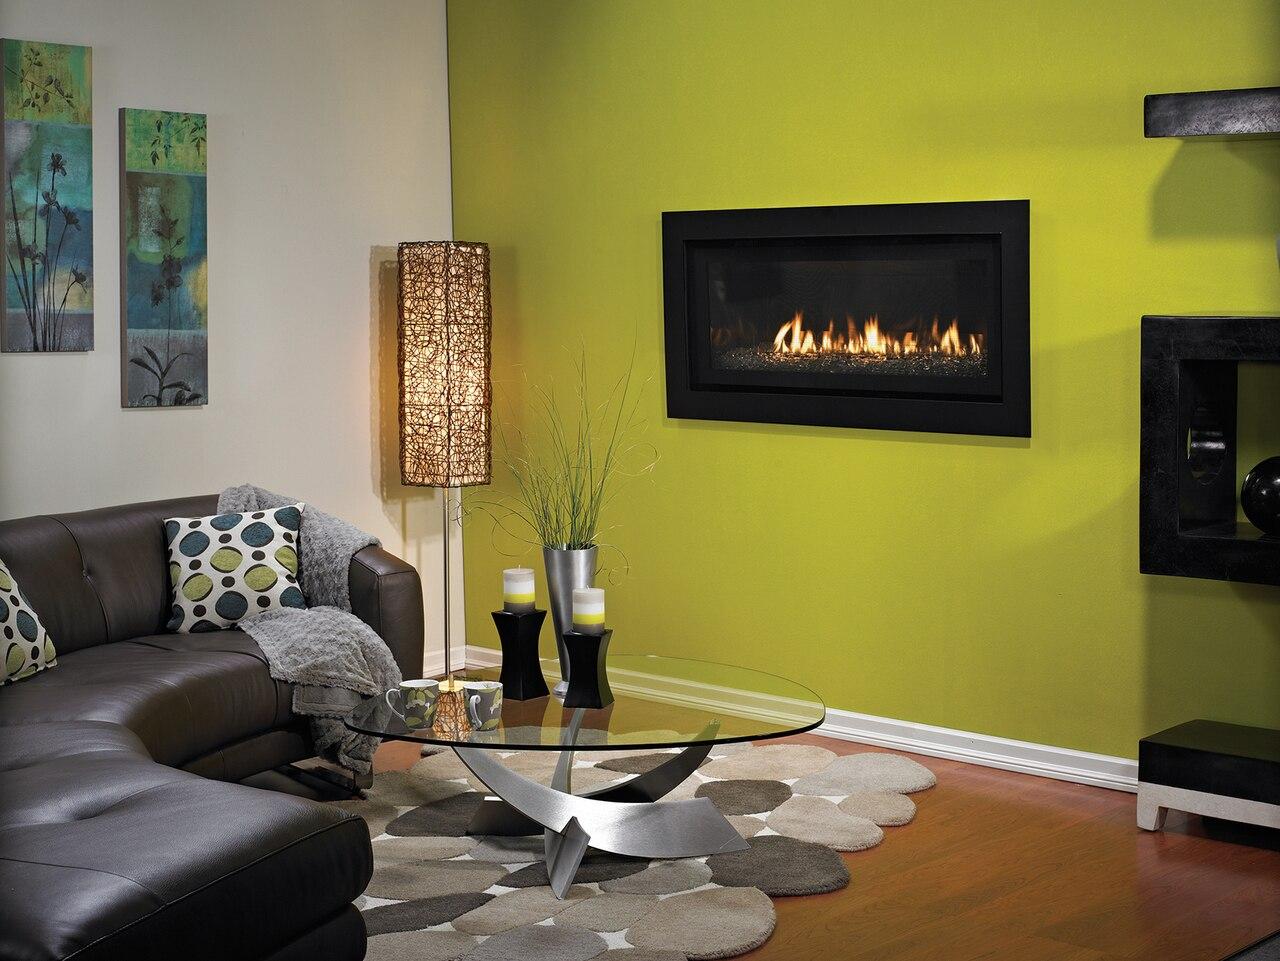 Empire DVLL41FP92P Boulevard Contemporary Direct Vent Fireplace